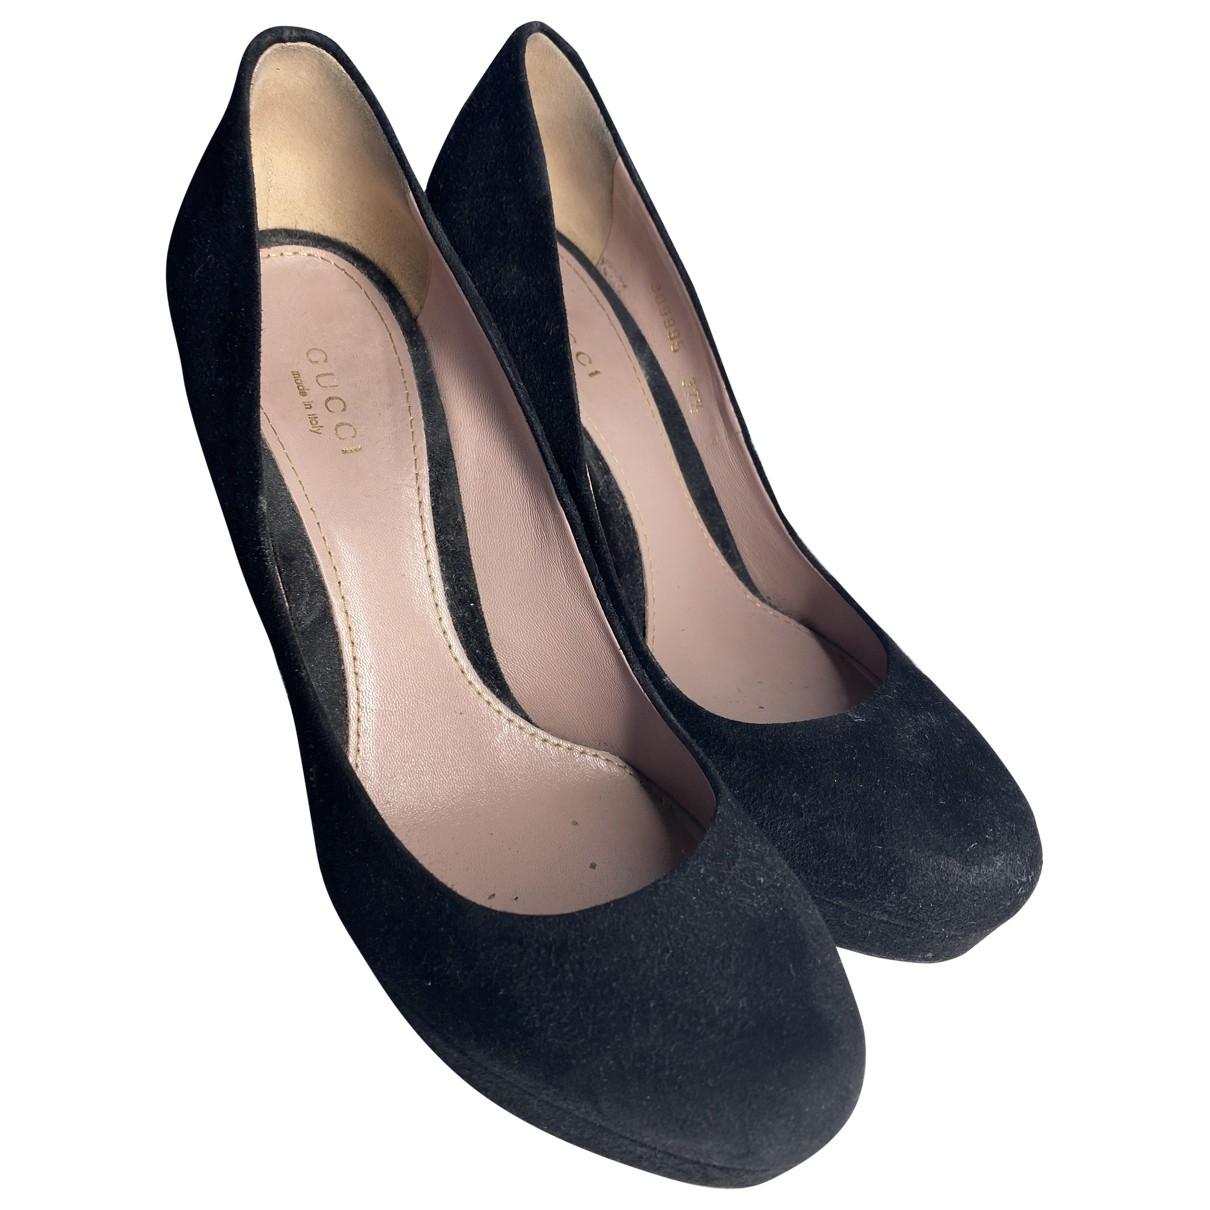 Gucci \N Black Suede Heels for Women 37.5 EU